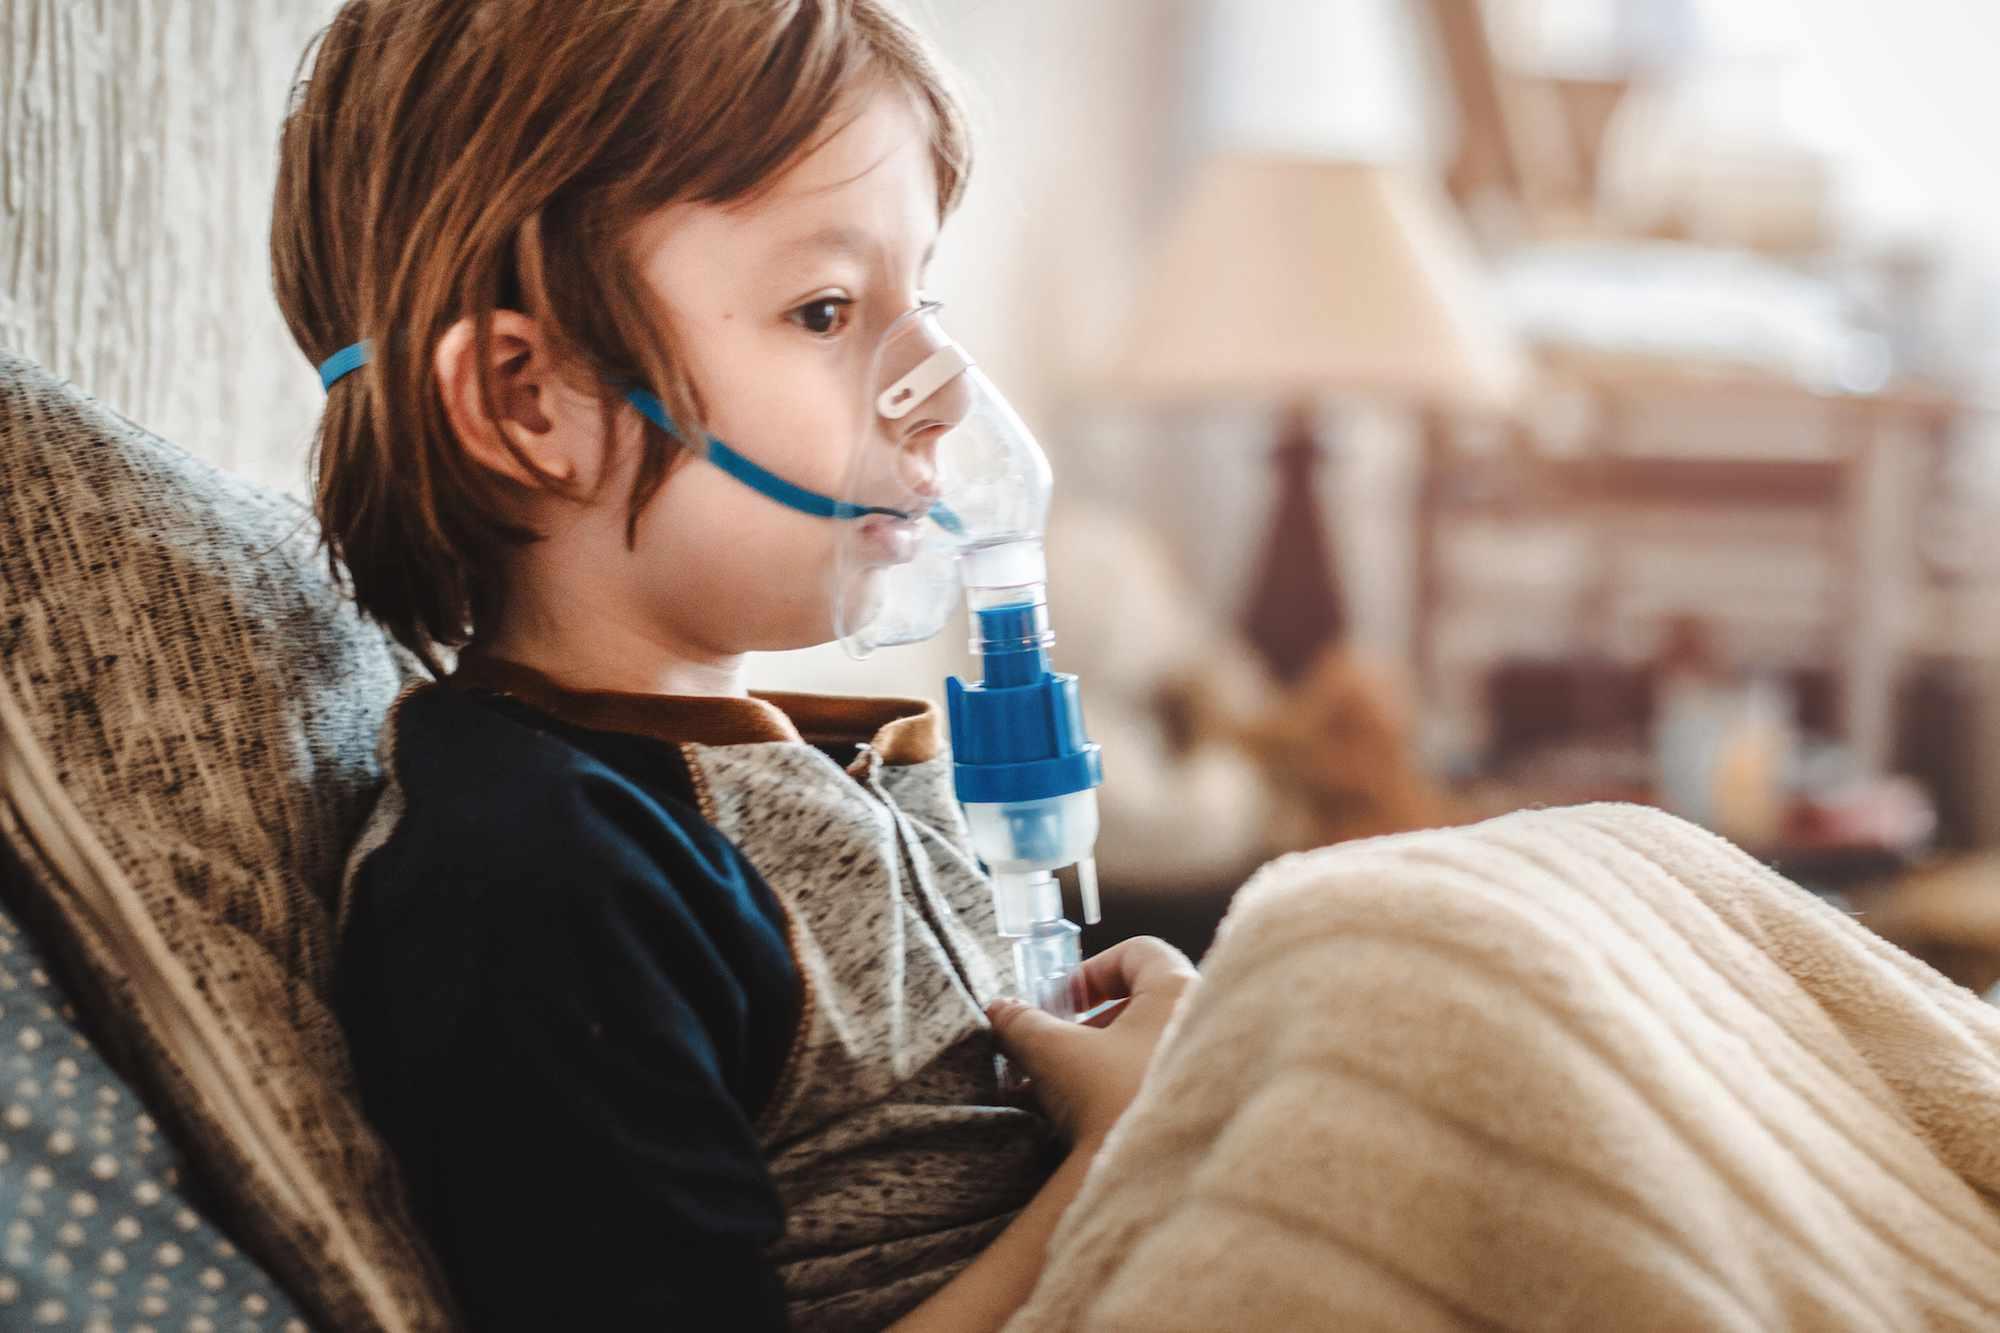 Little boy using a nebulizer